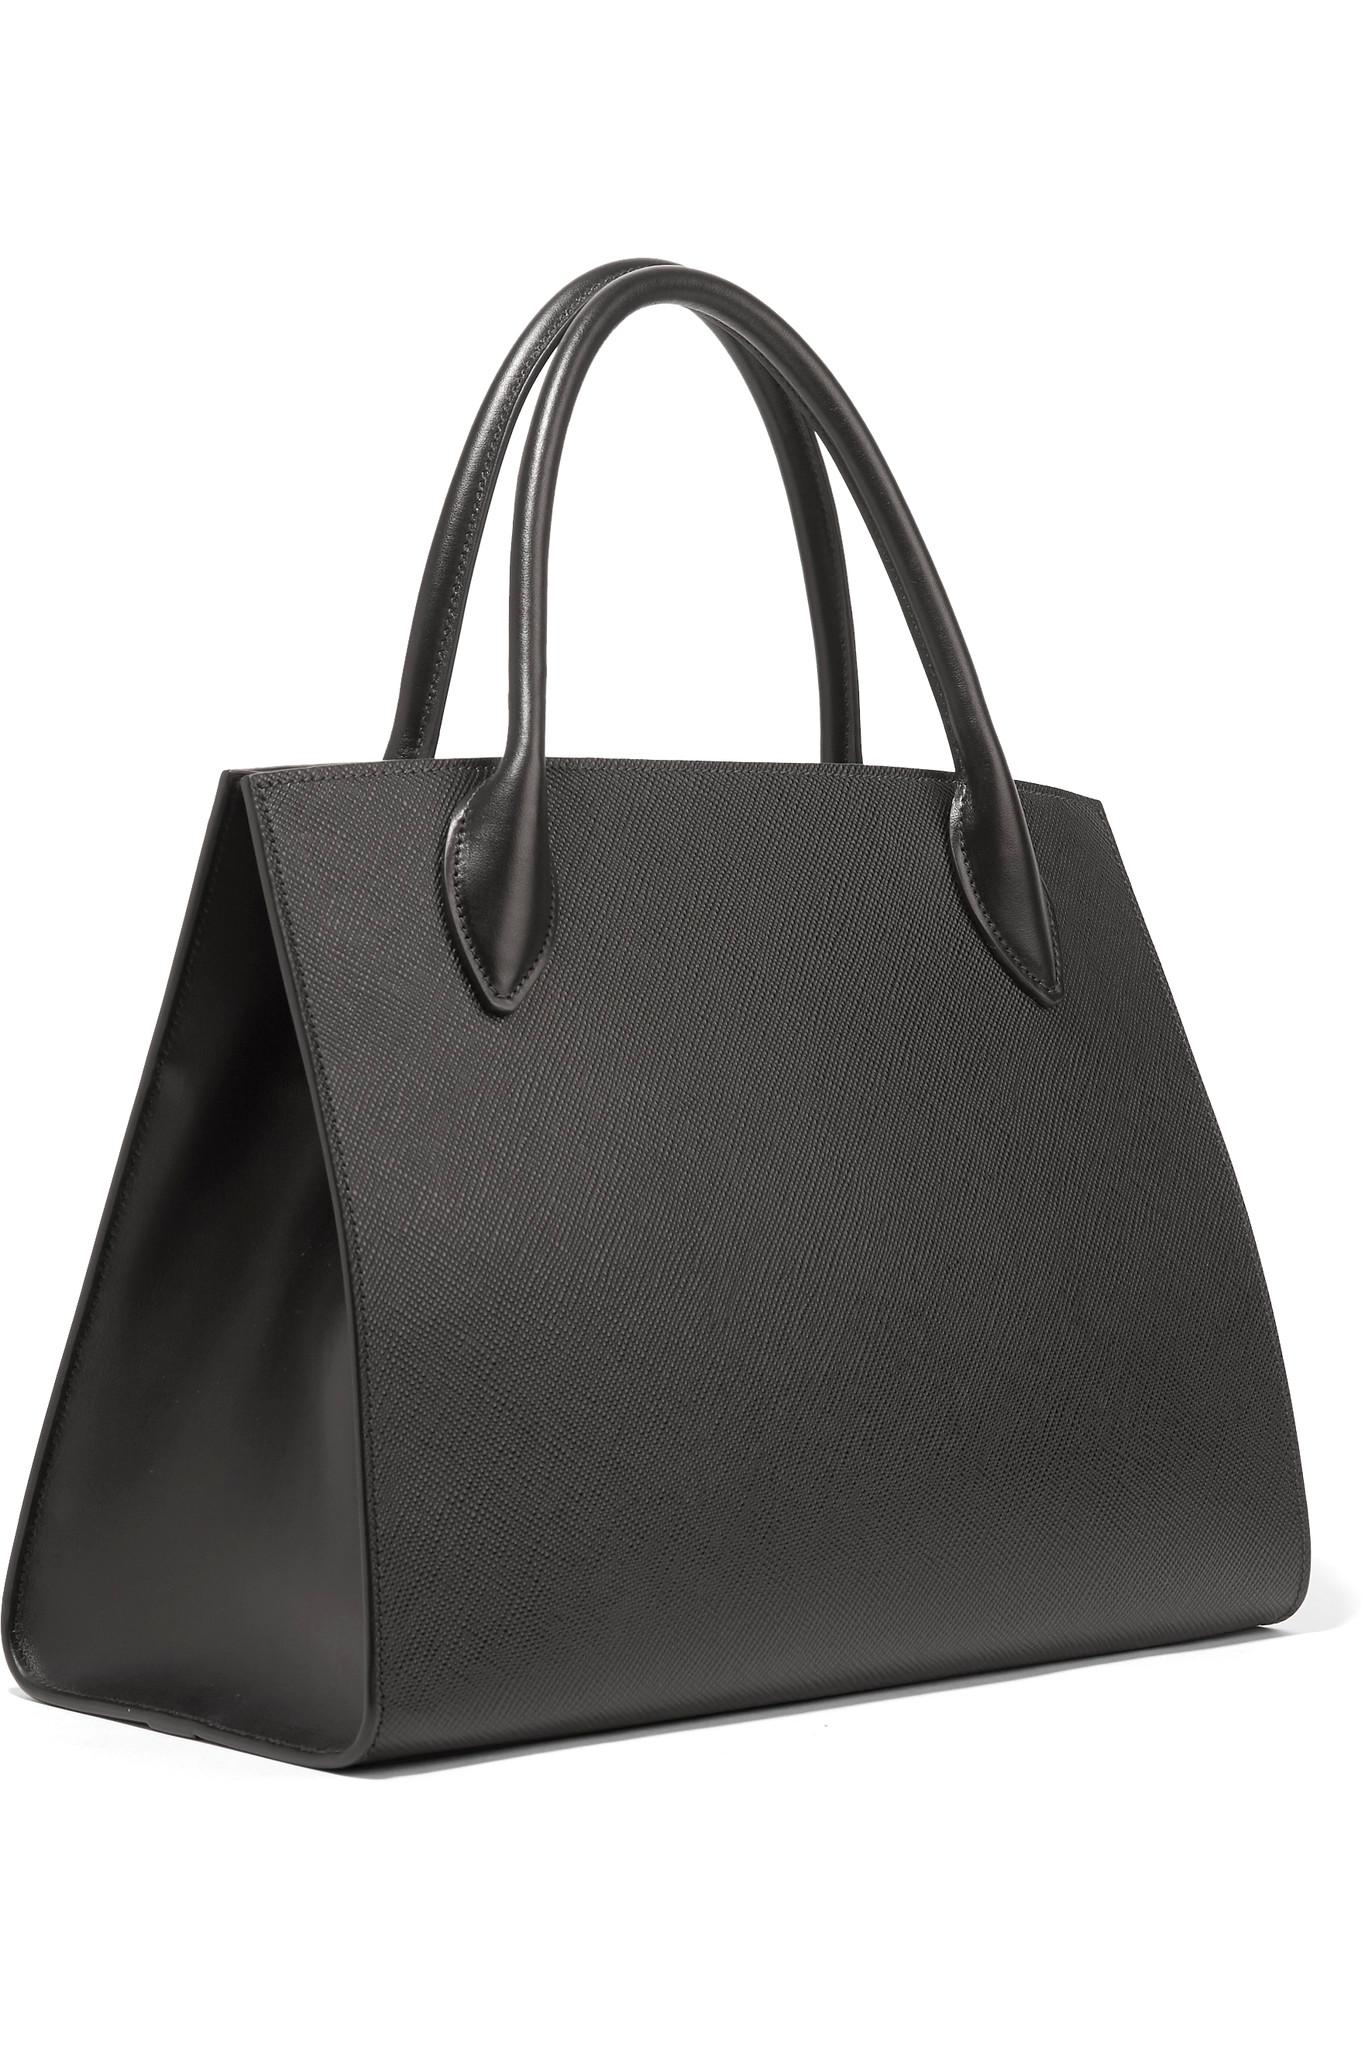 657ceb9c0a inexpensive prada shoulder bag a312a d2317  official store prada black  textured leather tote lyst. view fullscreen 6a41b 7f9c9